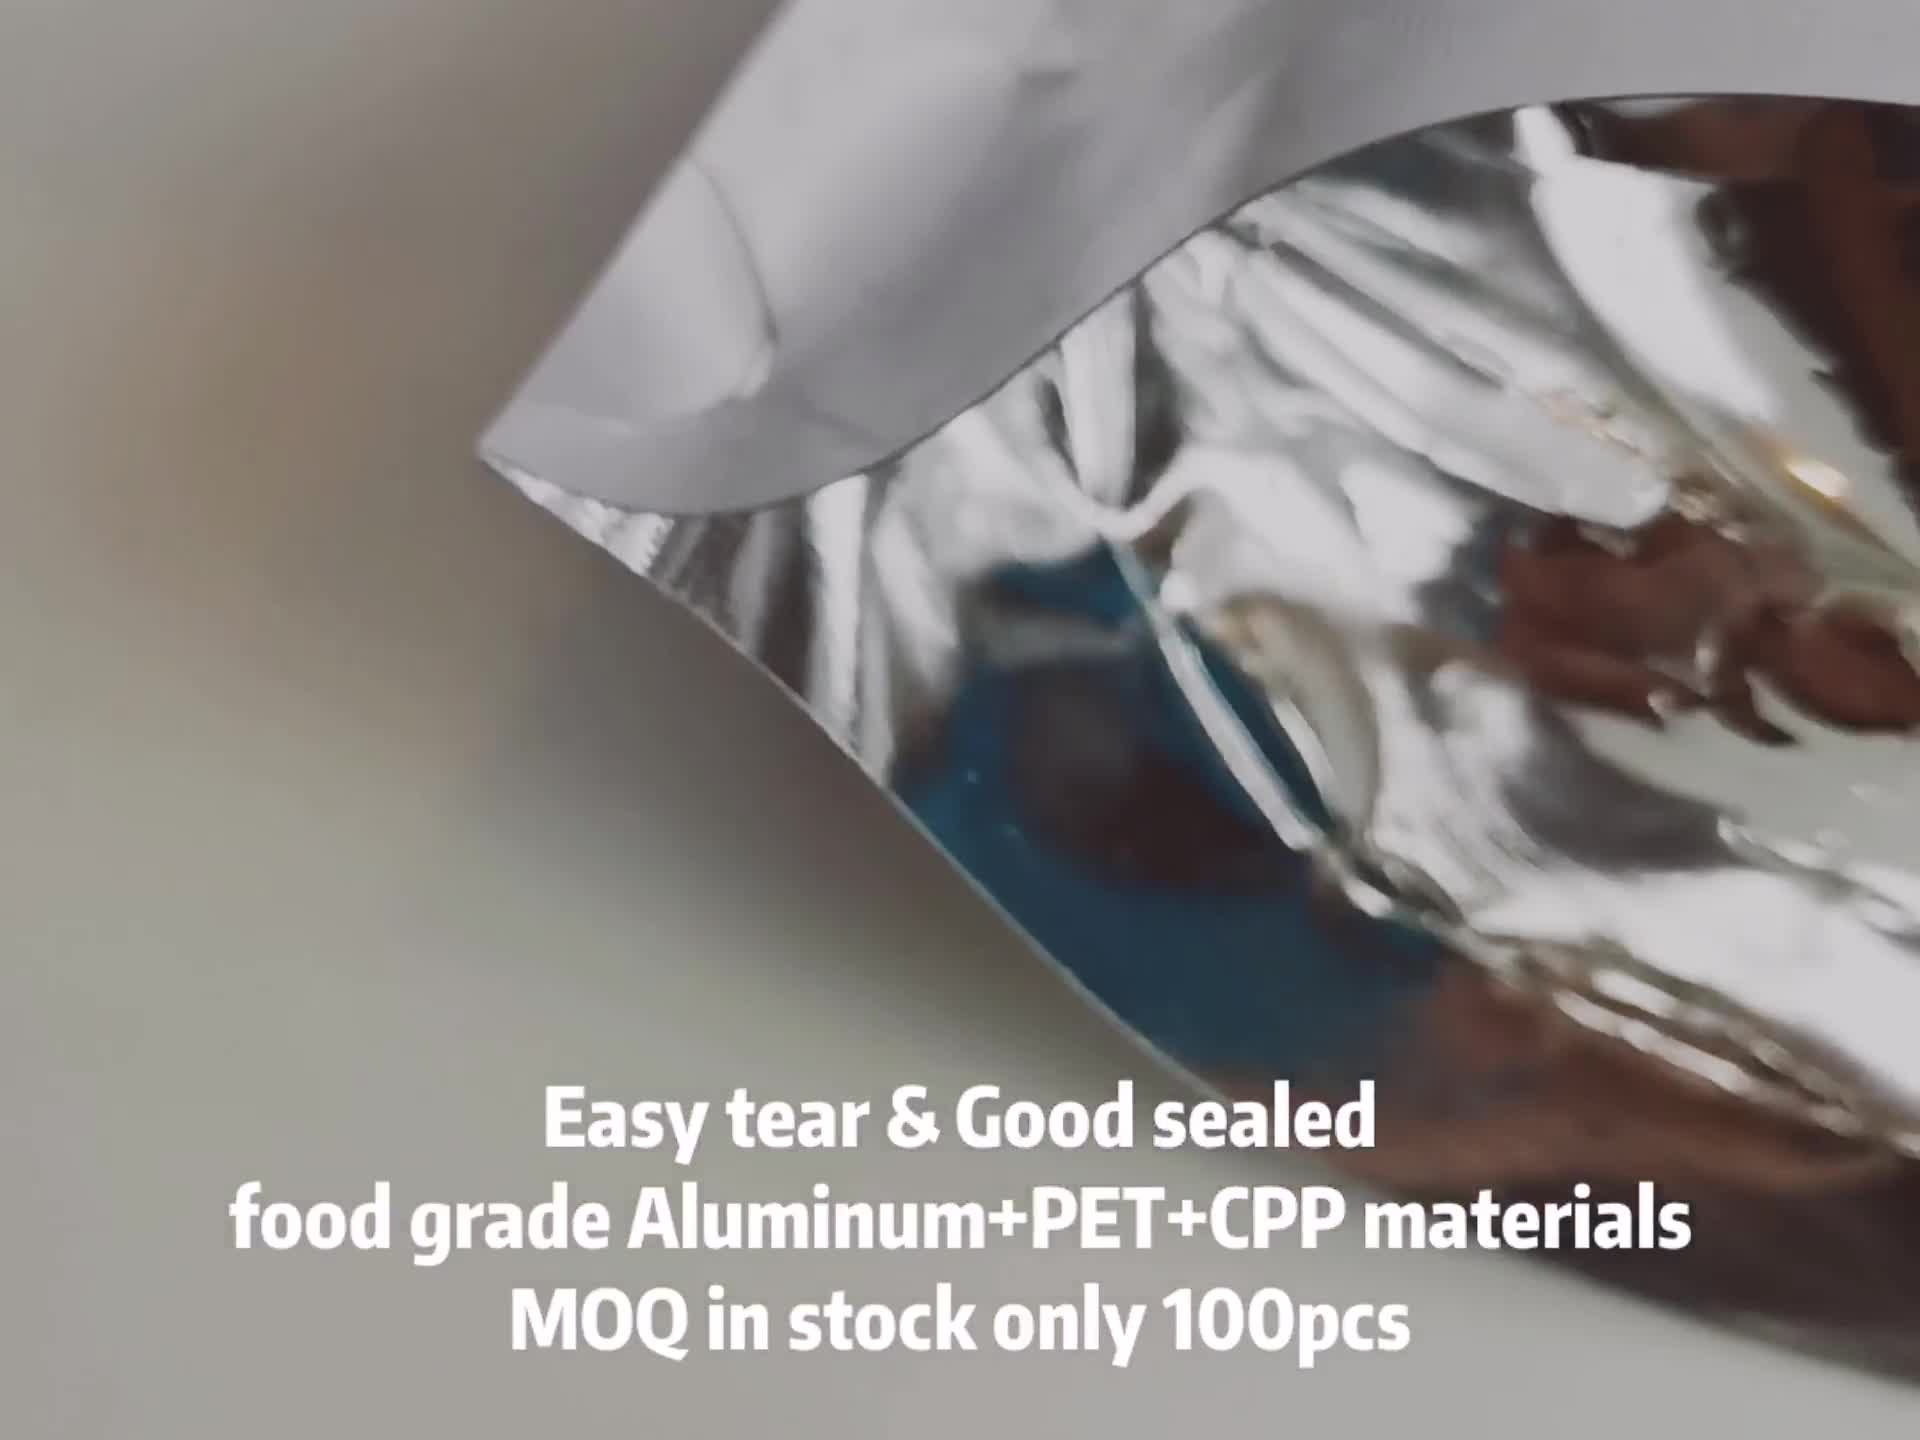 "100 स्पष्ट सामने एल्यूमीनियम पन्नी खड़े हो जाओ के पैक पैकेज बैग Mylar ज़िप ताला खाद्य पाउच 9x14cm 3.5x5.5"""